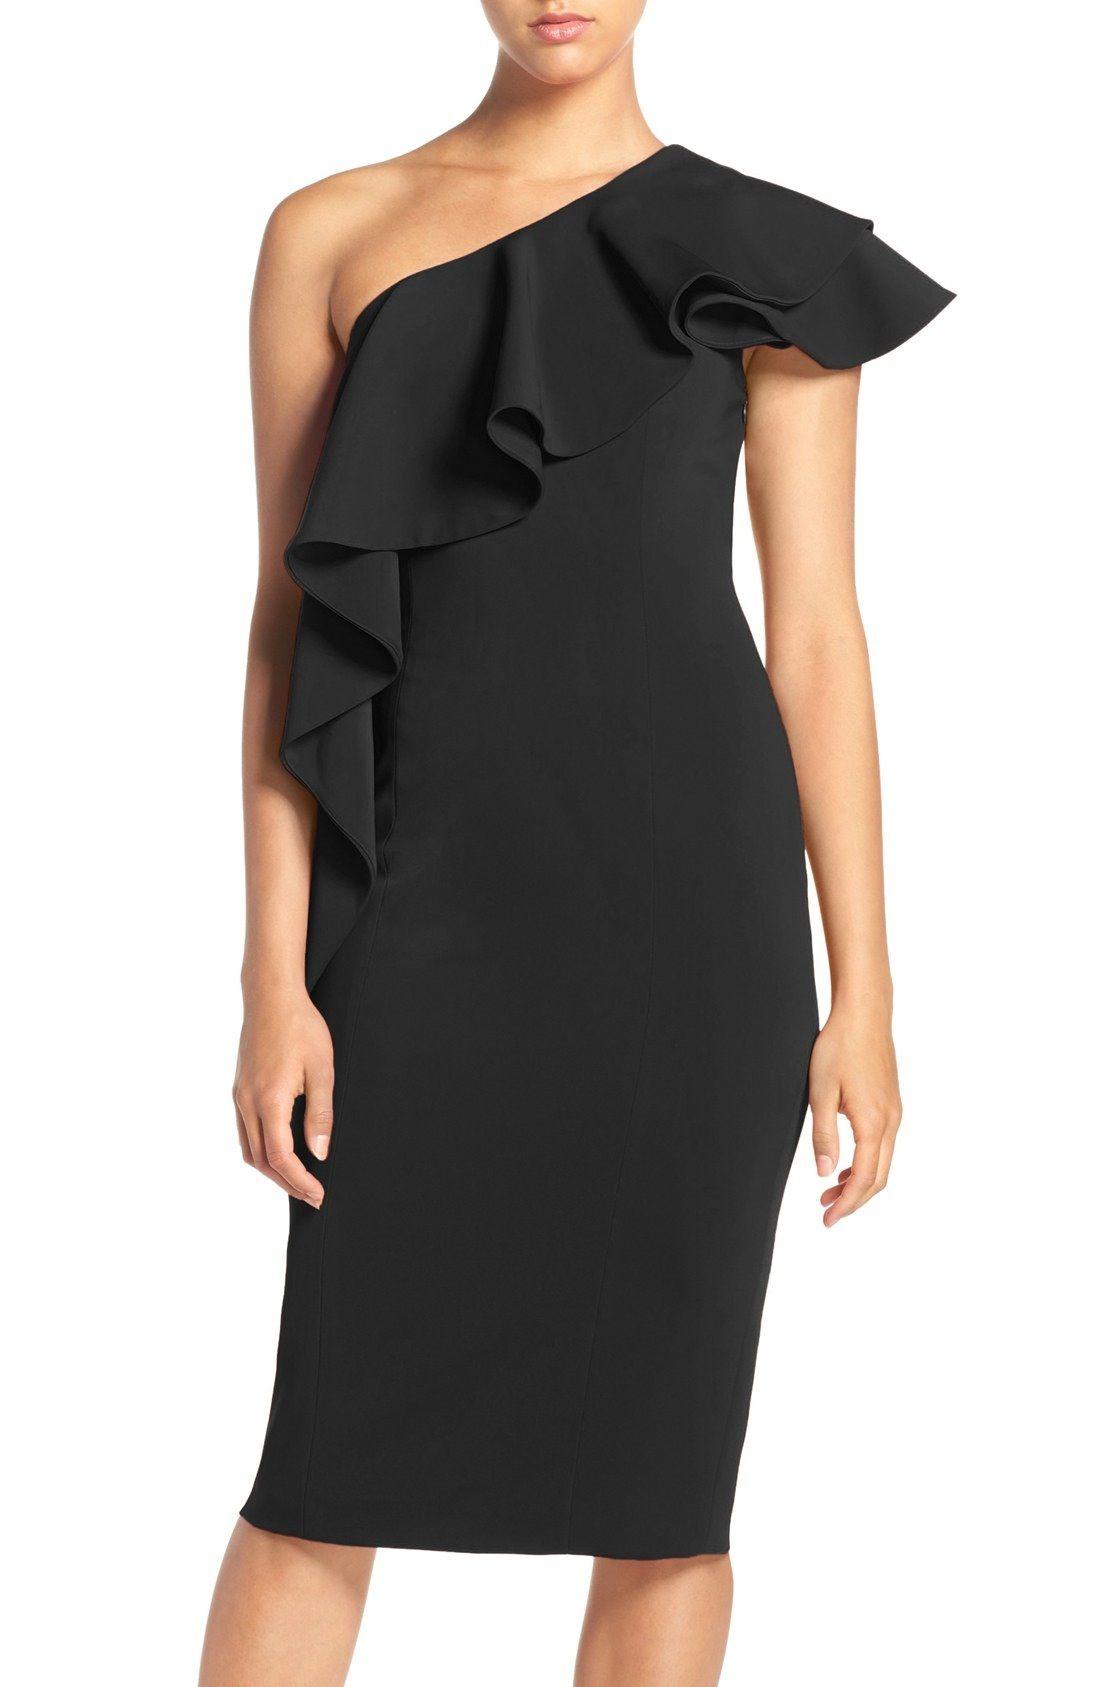 Jay Godfrey Fresno Ruffle One Shoulder Midi Dress Nordstrom Dresses One Shoulder Midi Dress Chic Cocktail Dress [ 1687 x 1100 Pixel ]